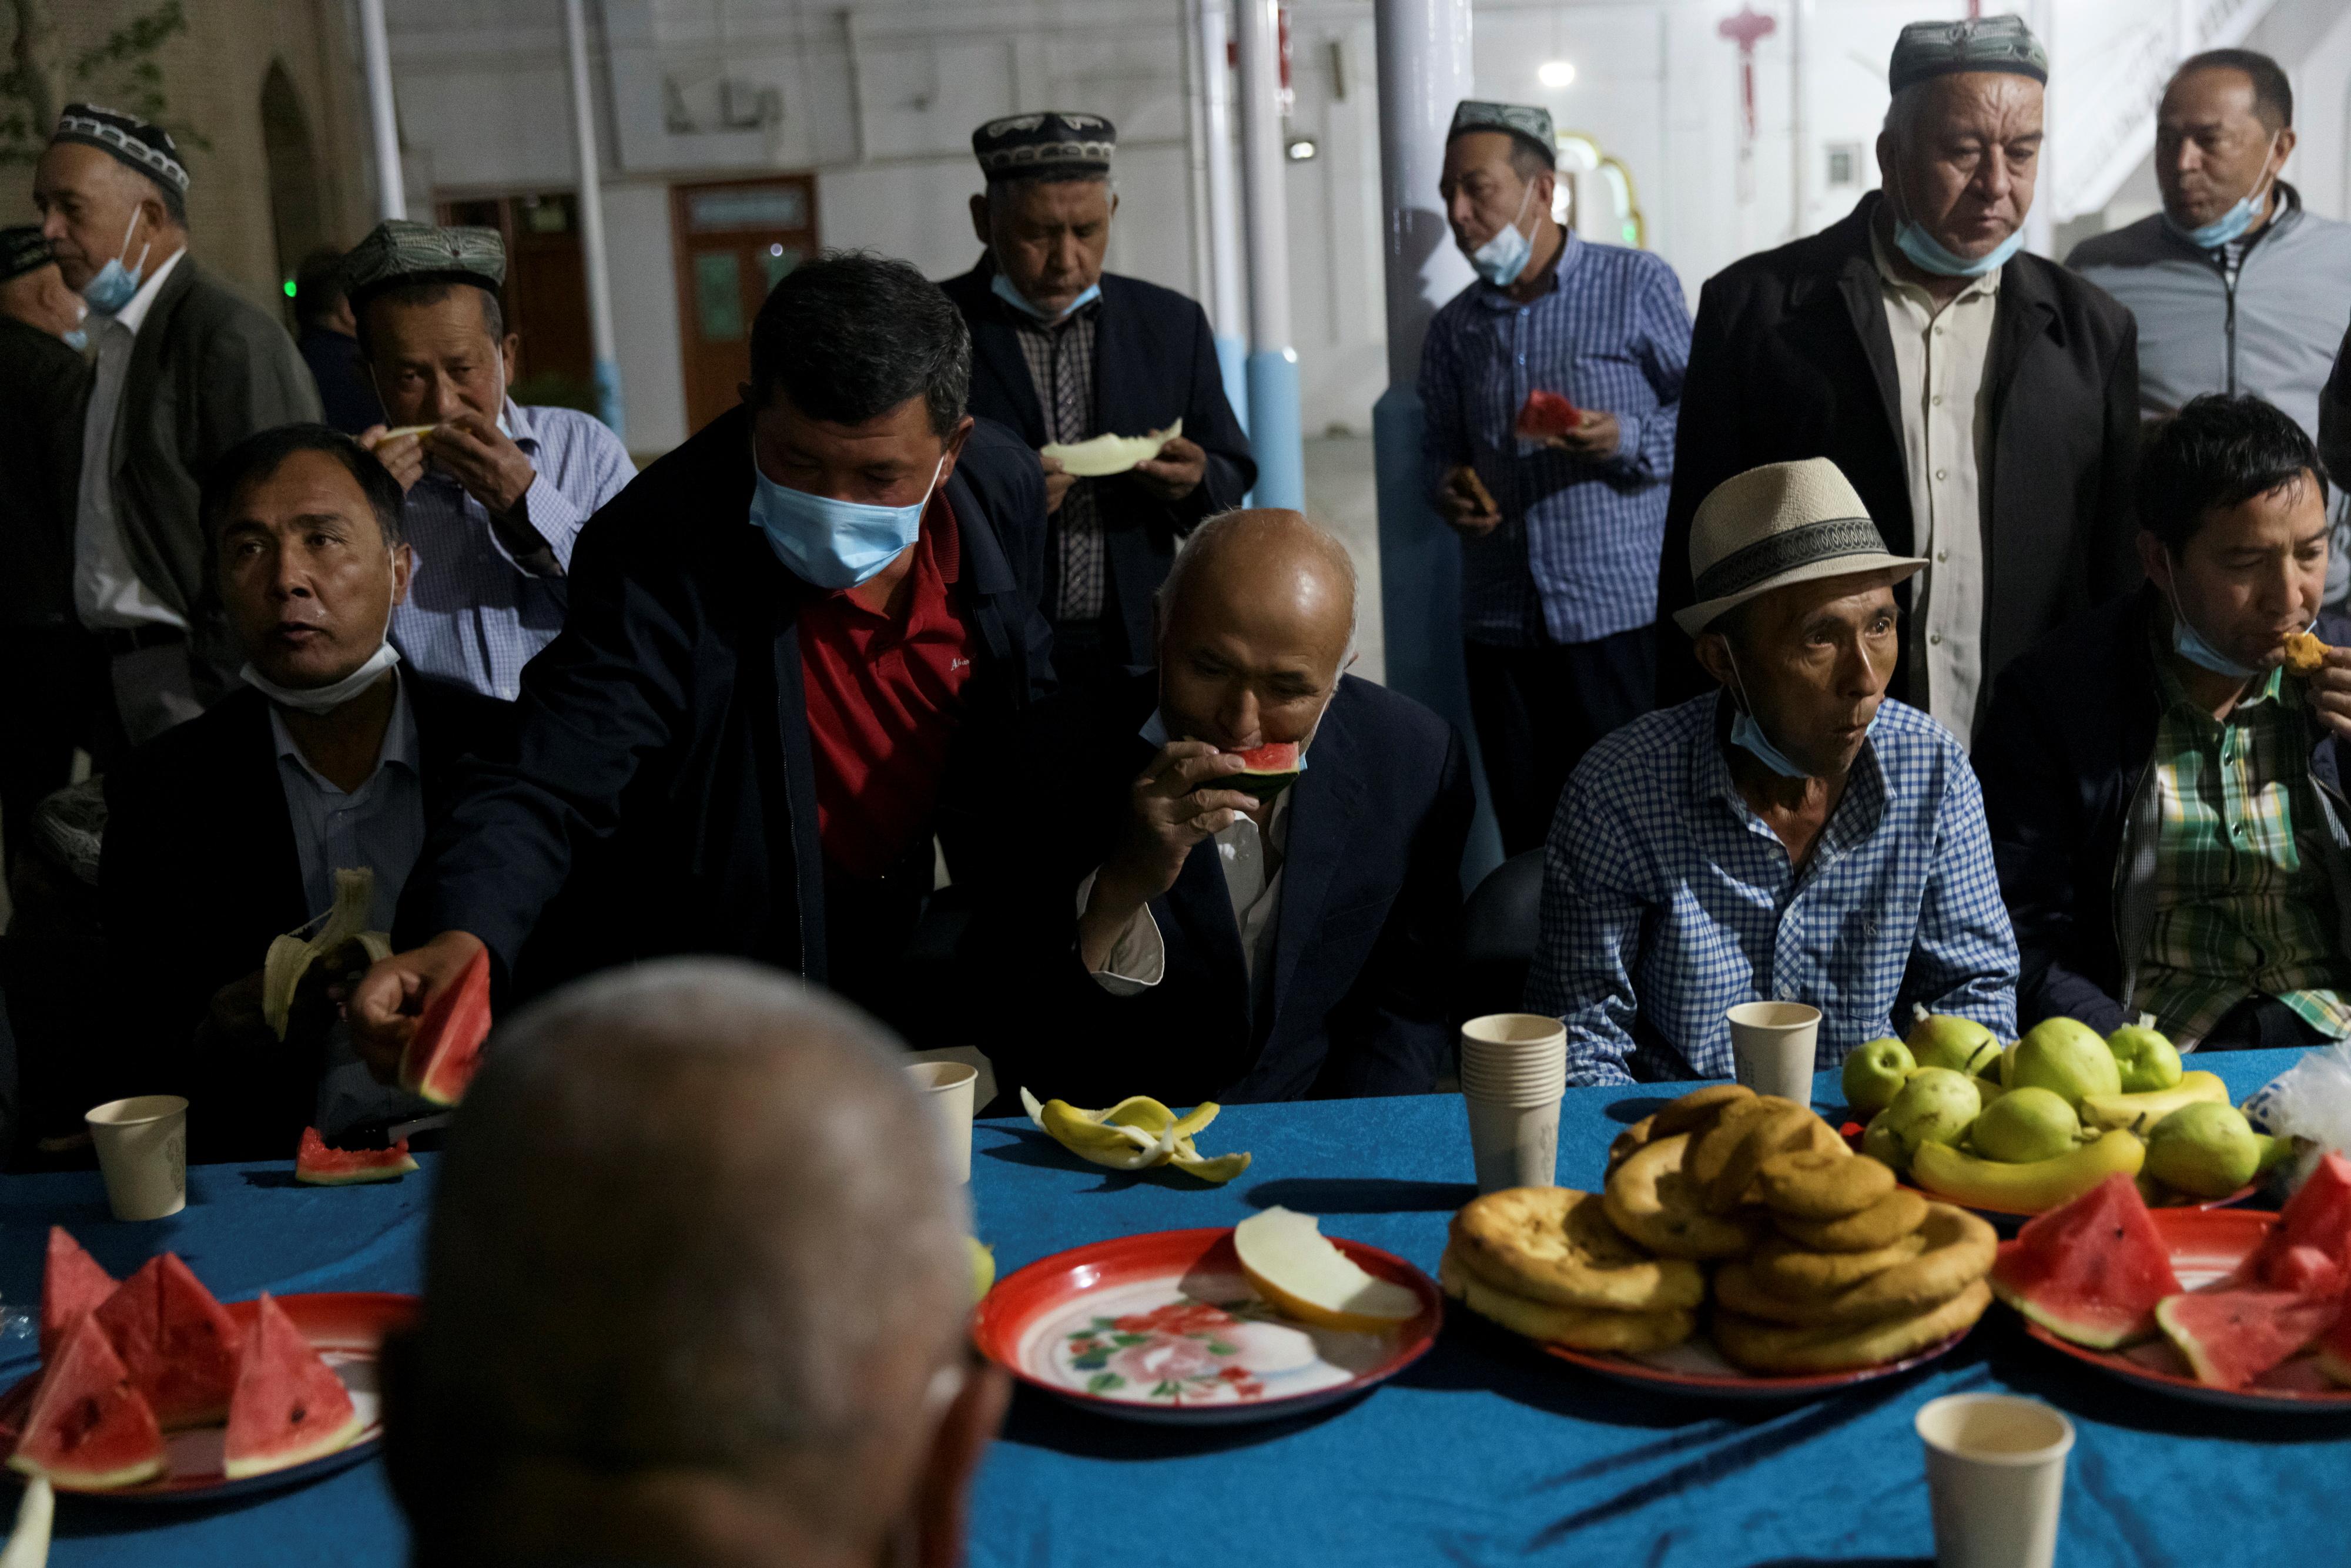 Muslims break their fast at Hotan Jiaman Mosque during the holy month of Ramadan in Hotan, Xinjiang Uyghur Autonomous Region, China, April 29, 2021. Picture taken April 29, 2021.  REUTERS/Thomas Peter